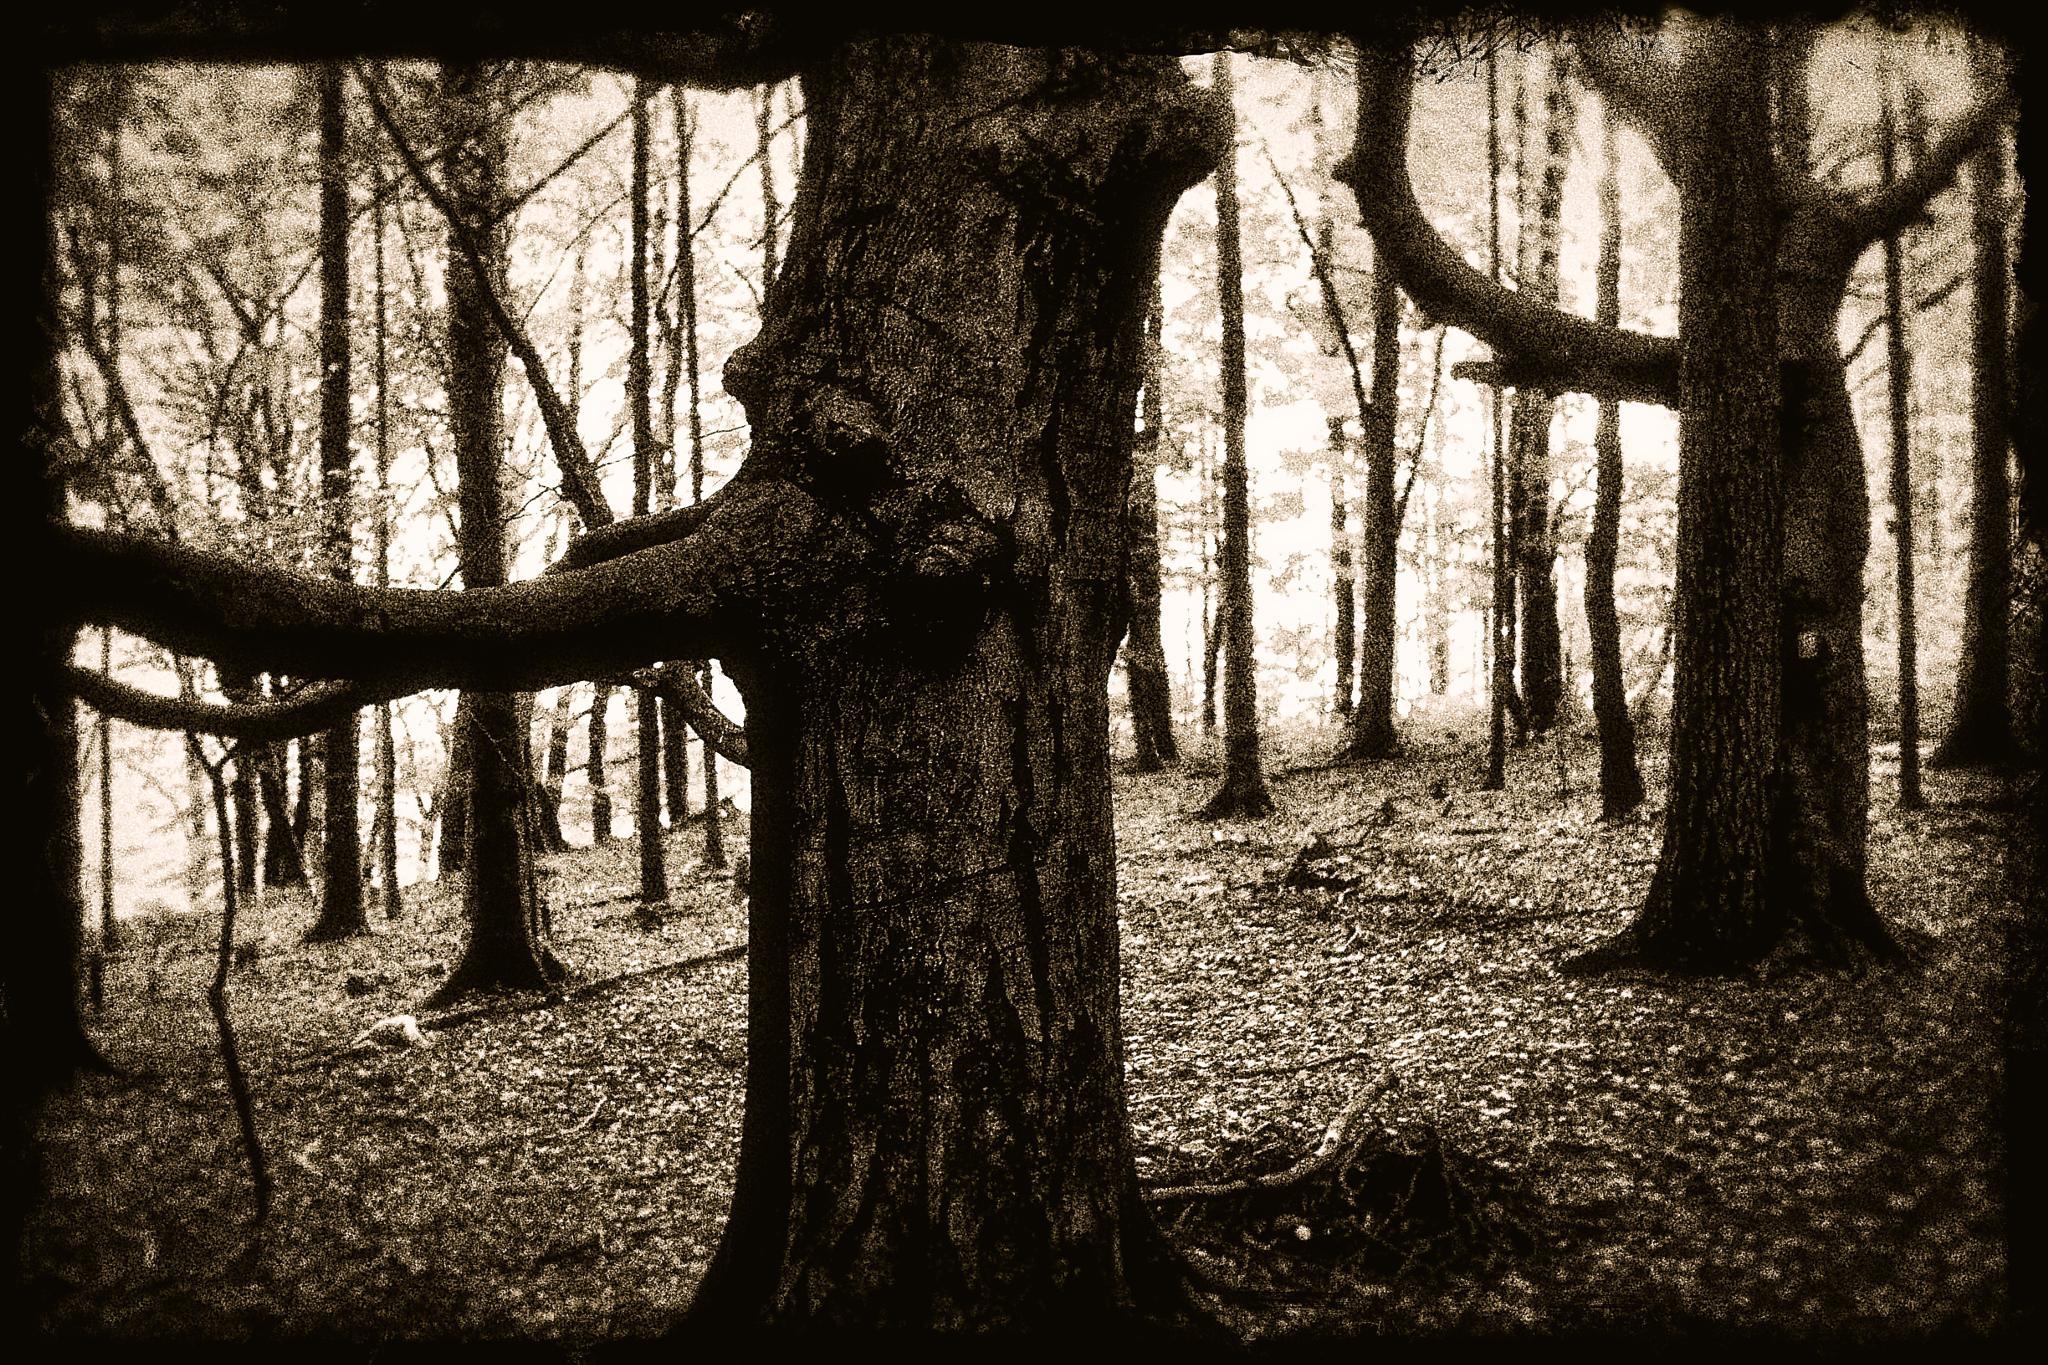 The Forest by peterkryzun